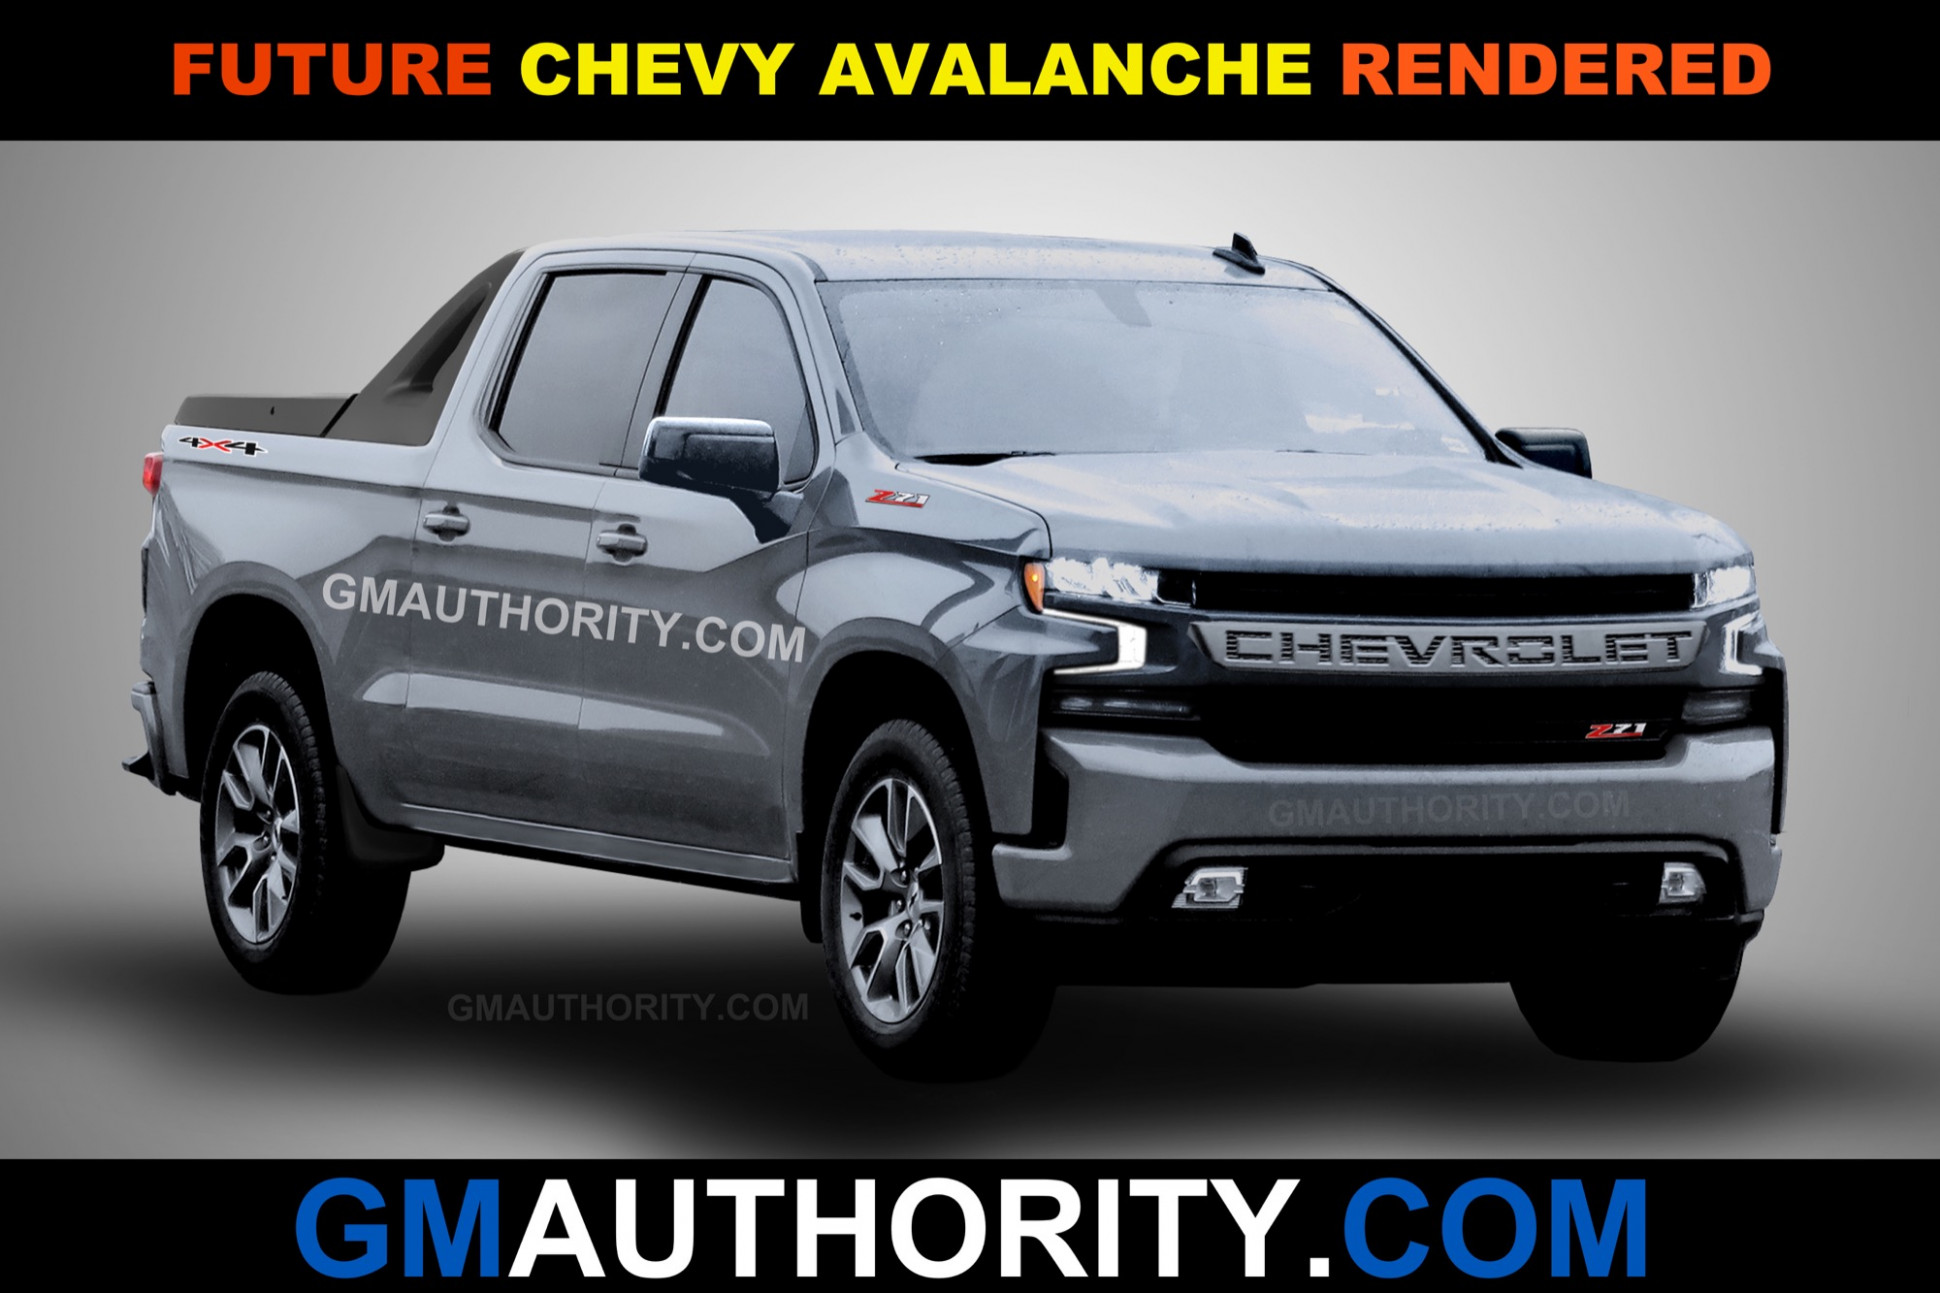 History Chevrolet Avalanche 2022